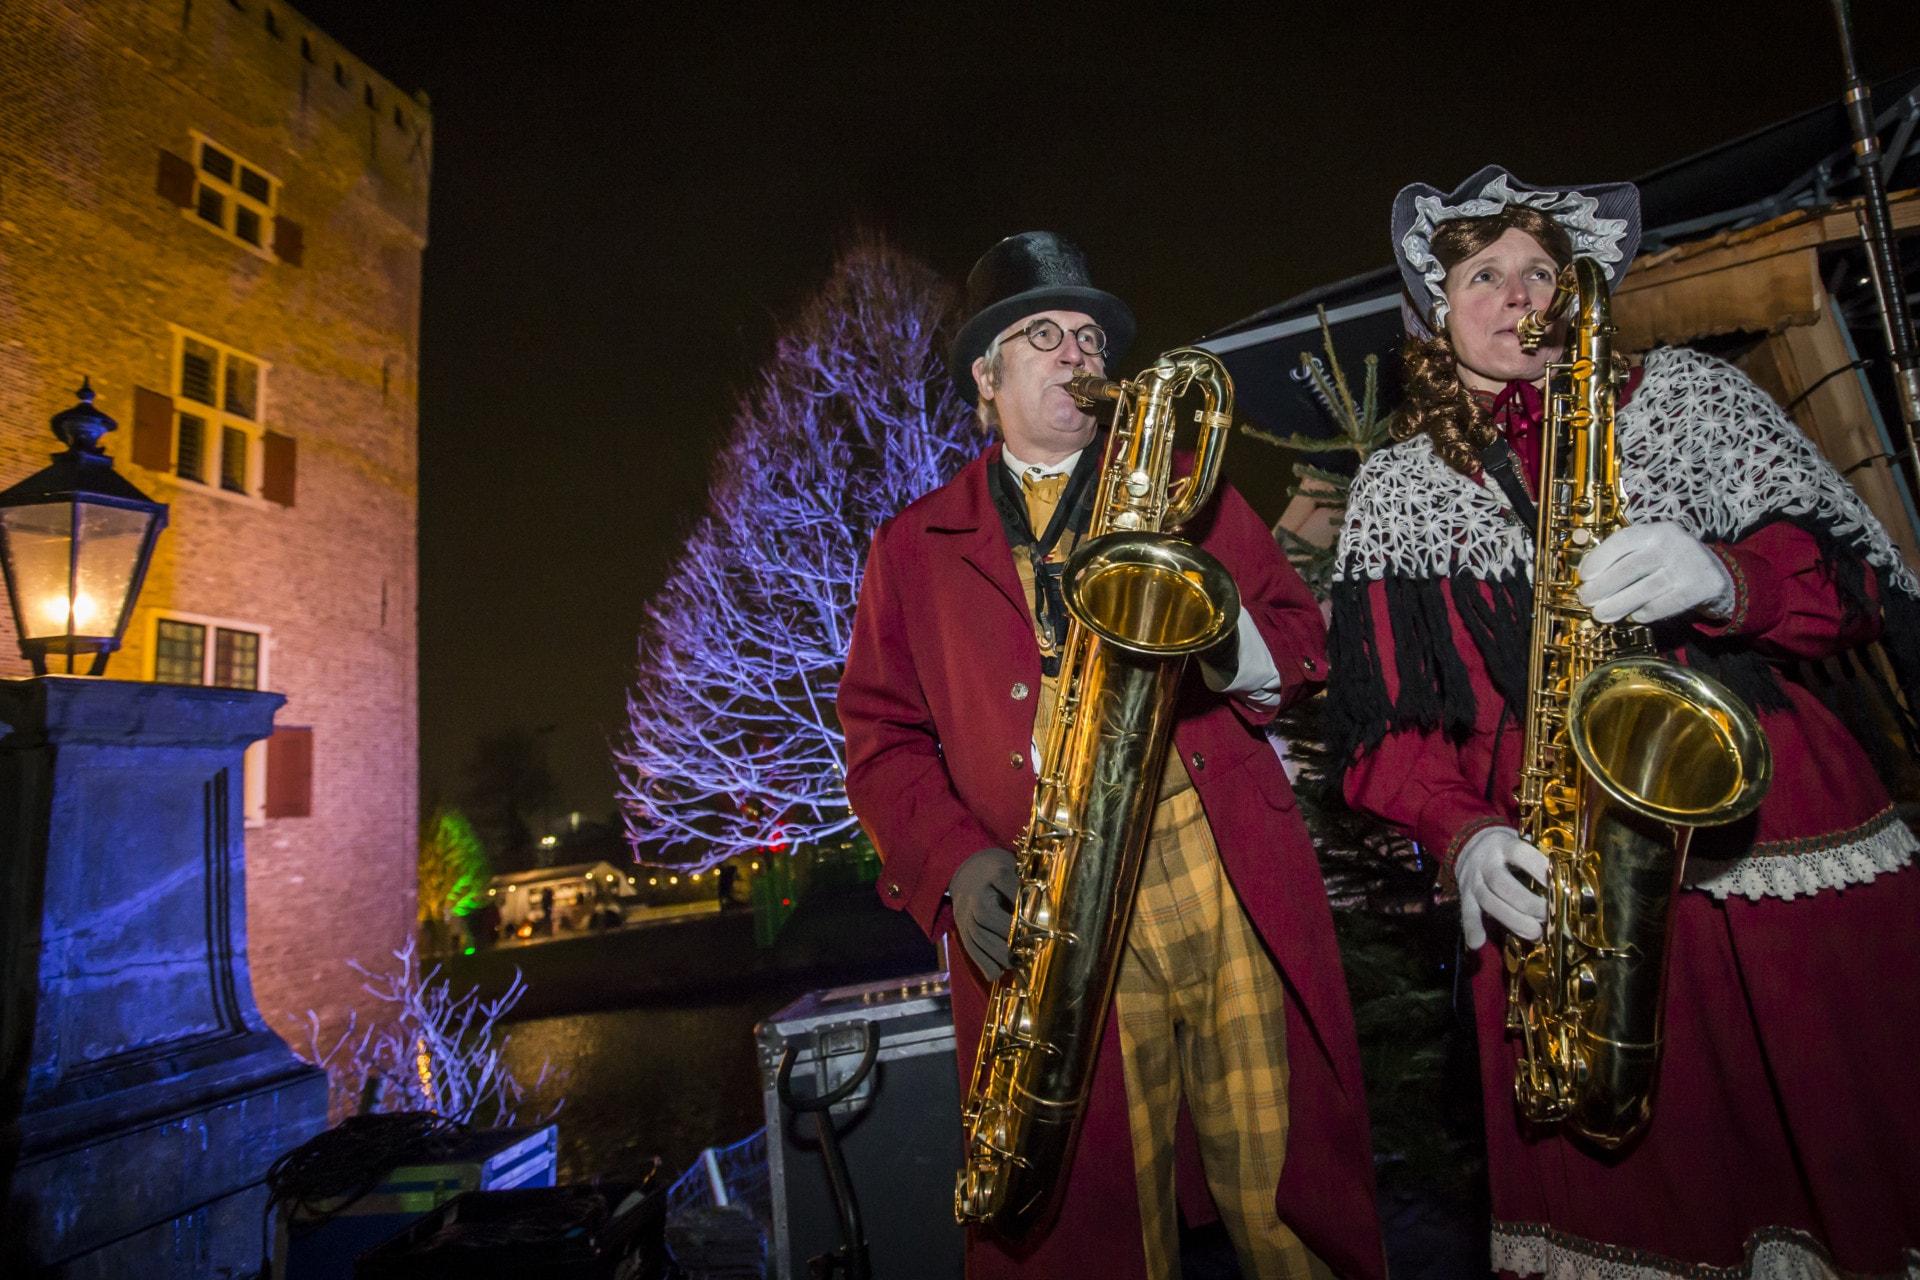 Kerstmarkt overzicht Slot Assumburg Noord Holland